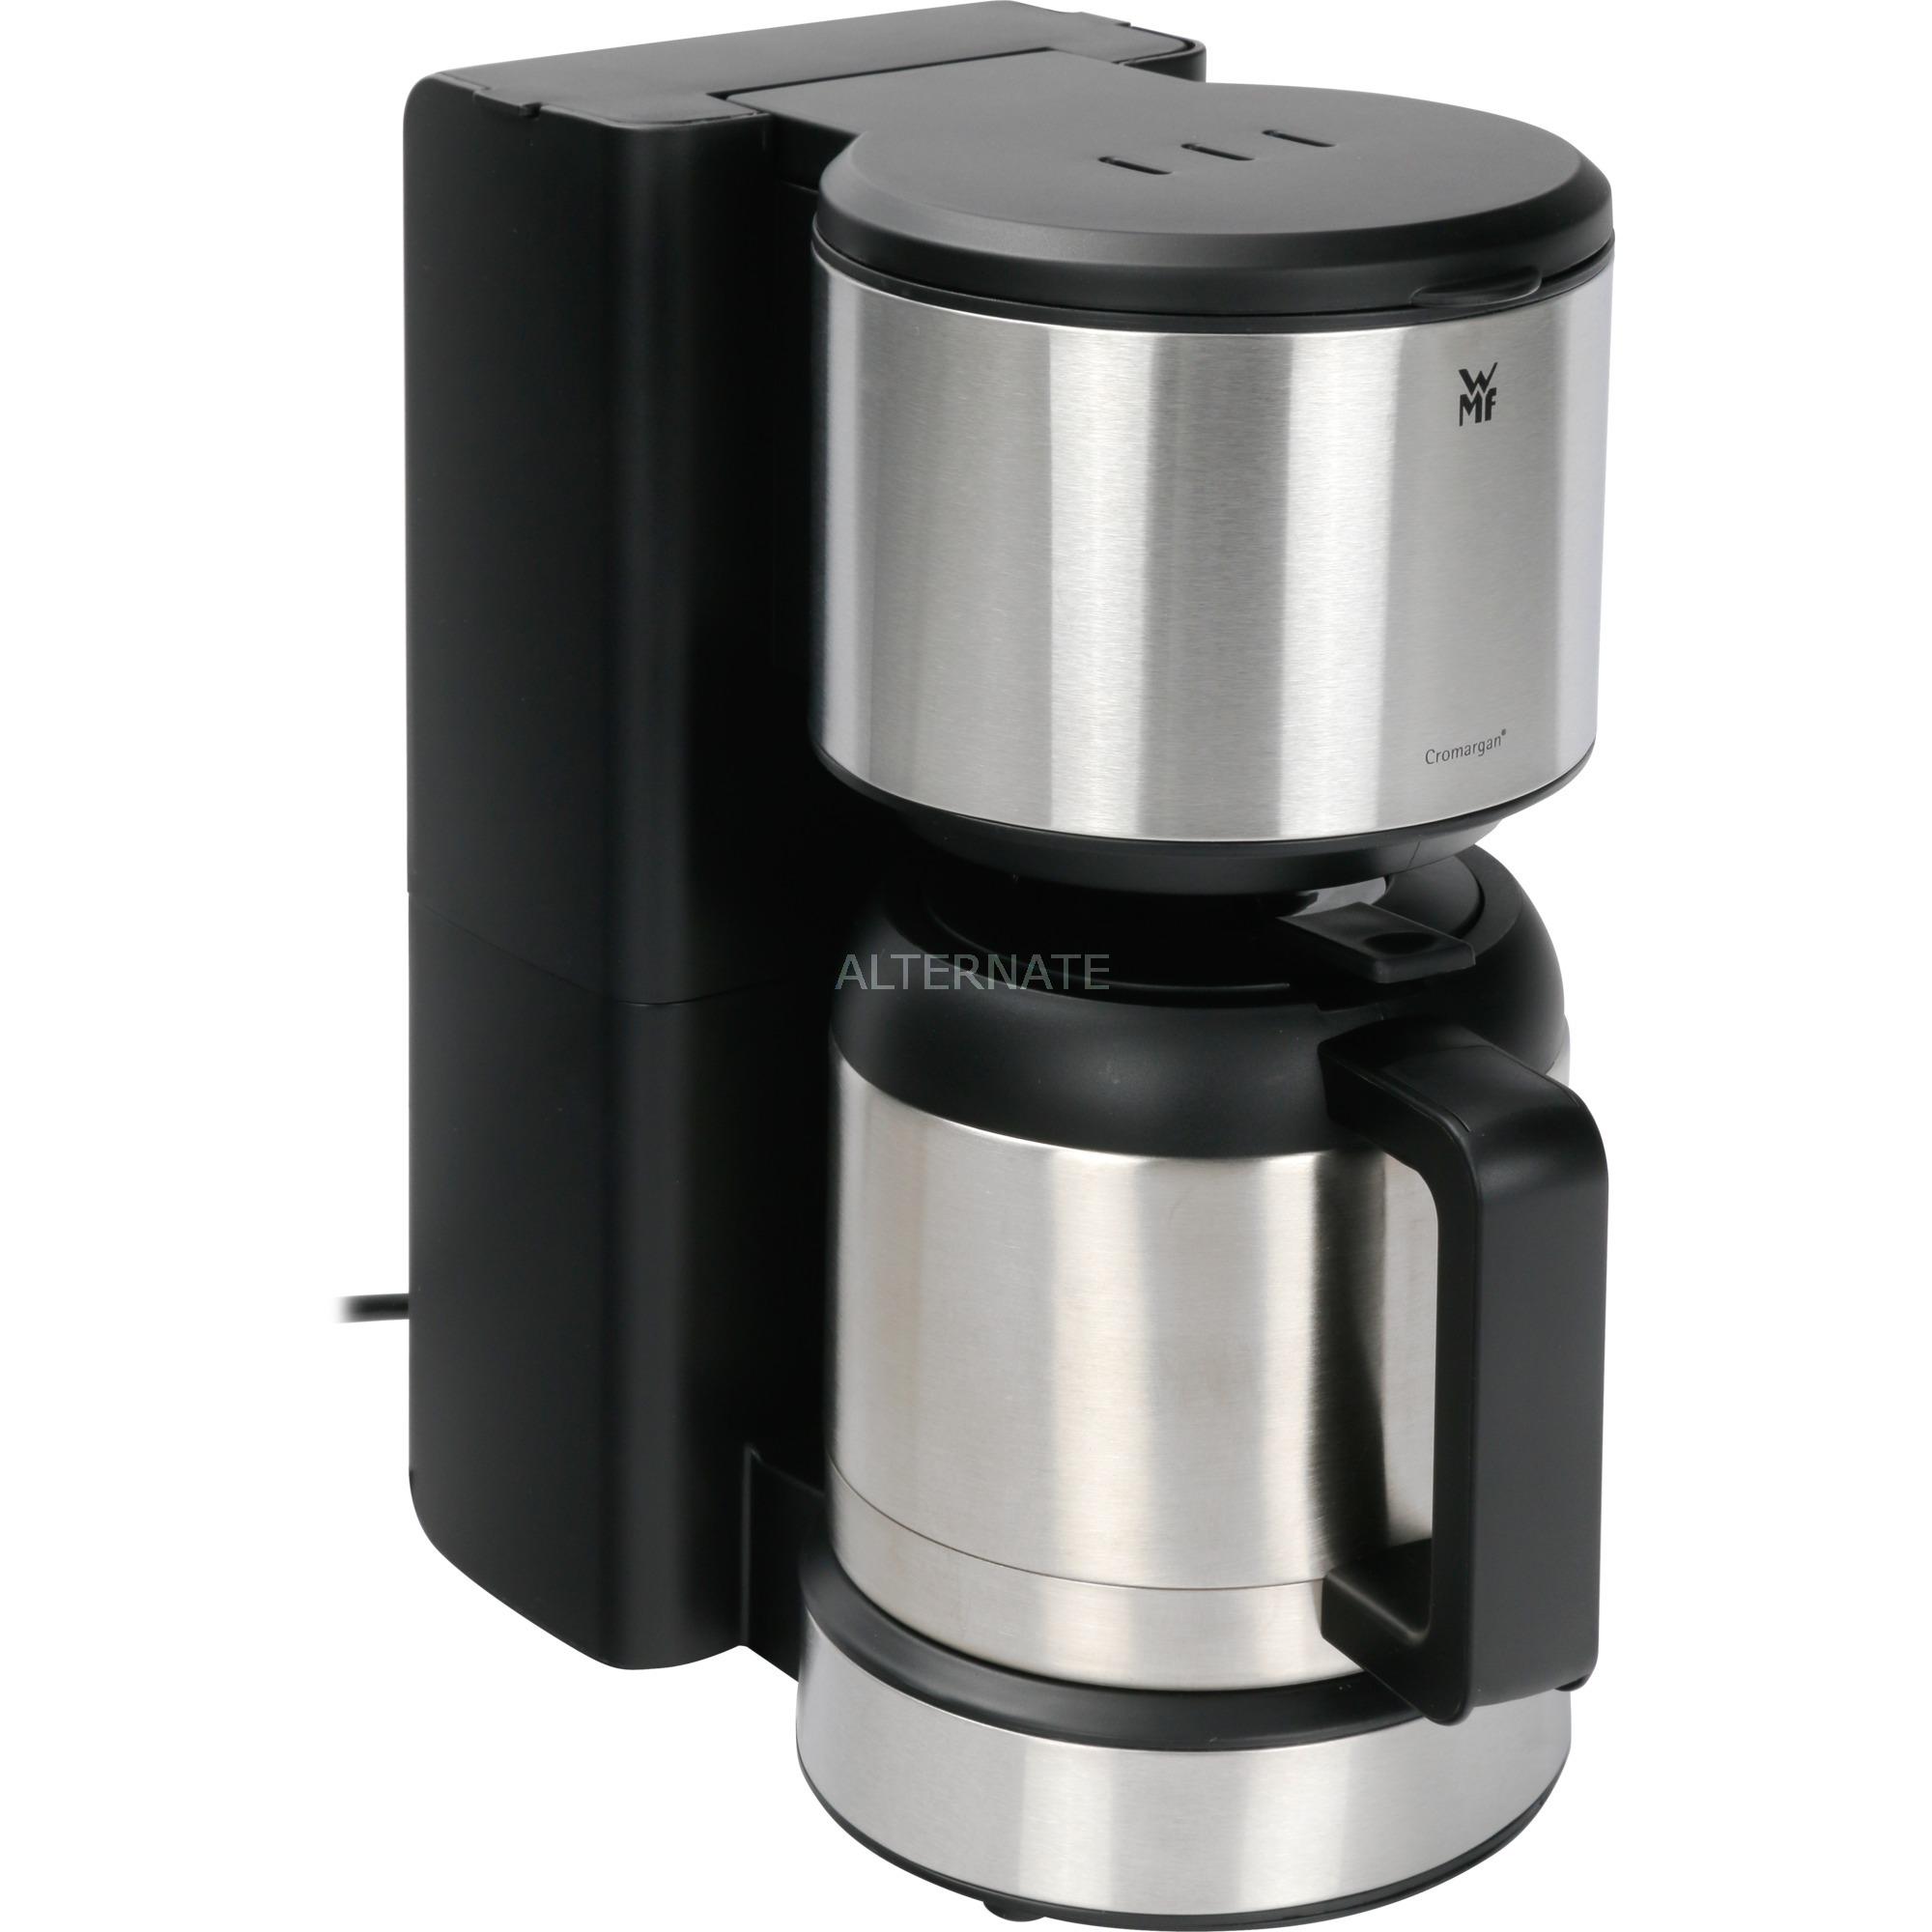 Aroma Thermo Stelio Independiente Cafetera de filtro 1L 8tazas Negro, Acero inoxidable